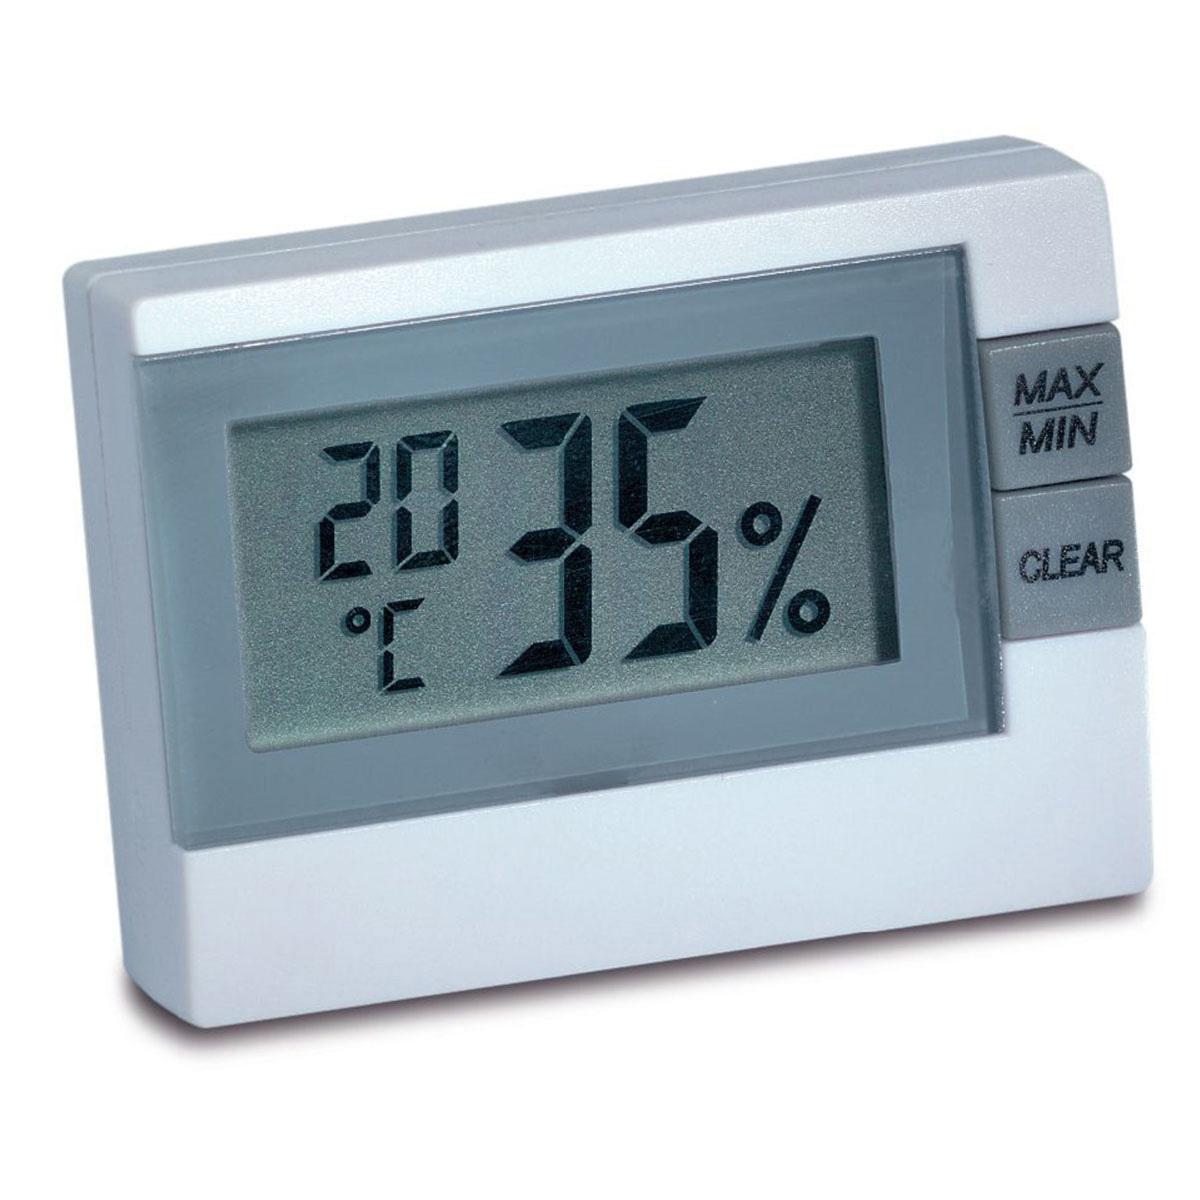 30-5005-02-digitales-thermo-hygrometer-1200x1200px.jpg